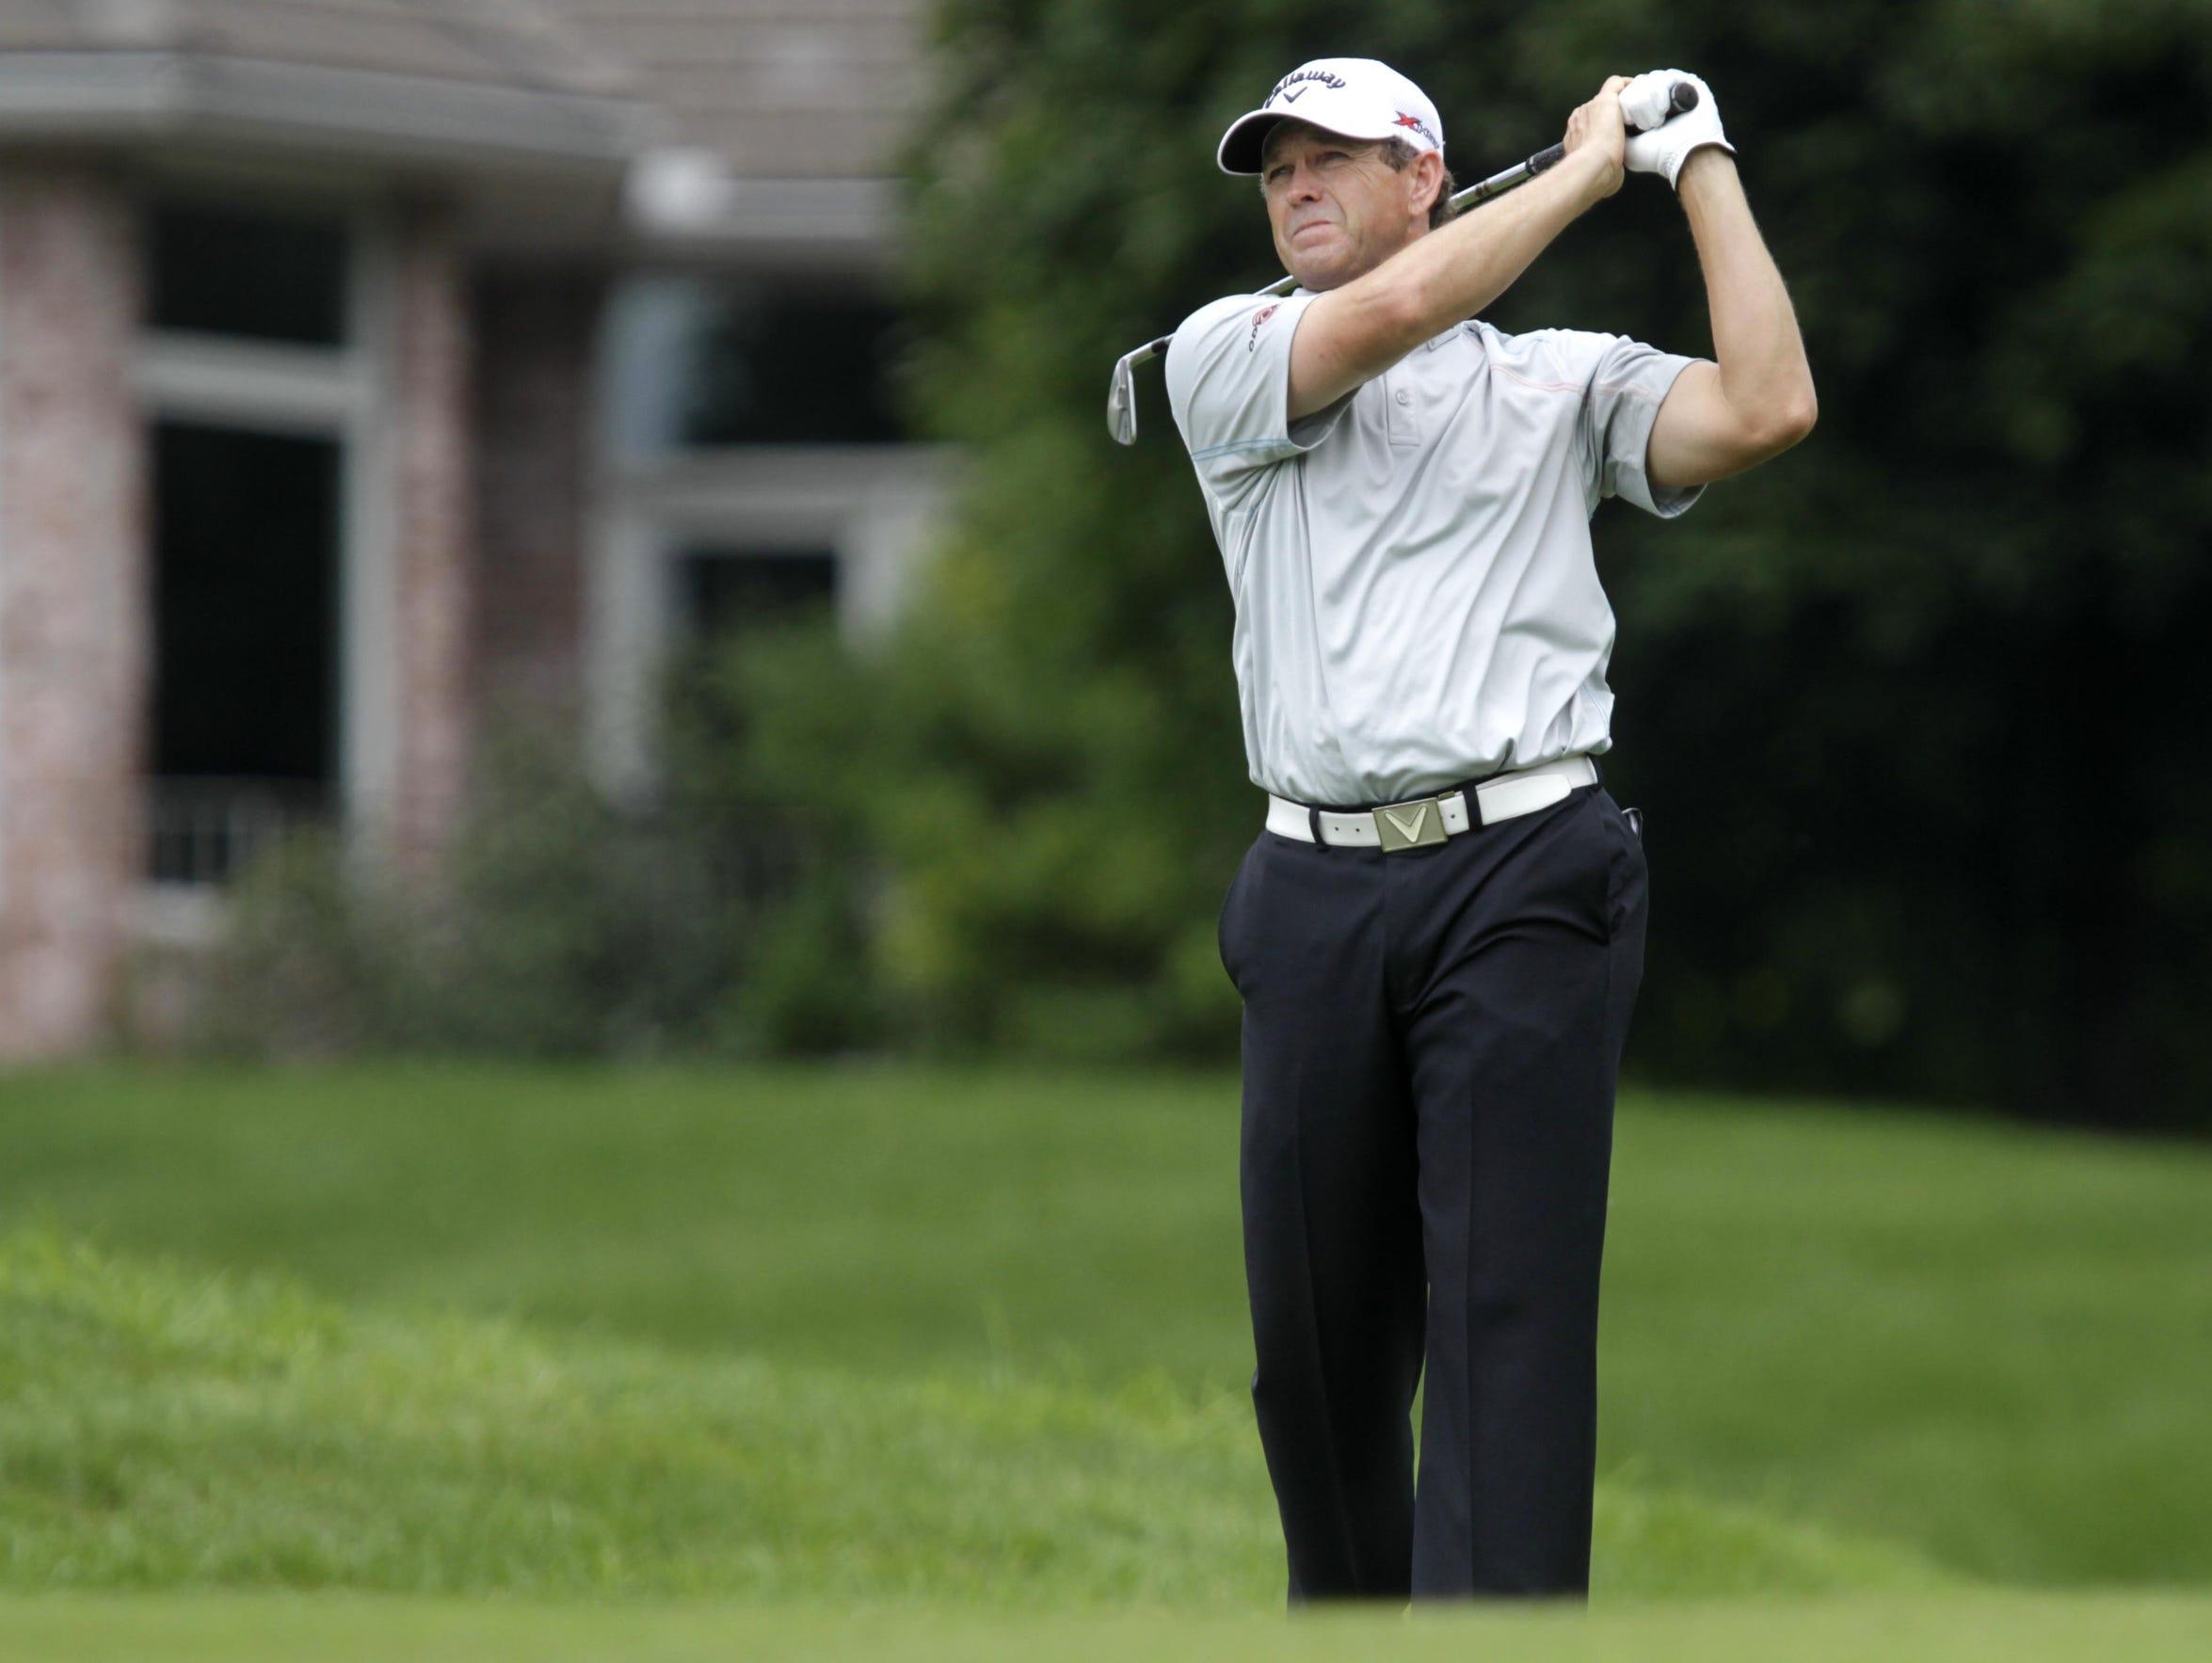 Lee Janzen won two U.S. Open championships.